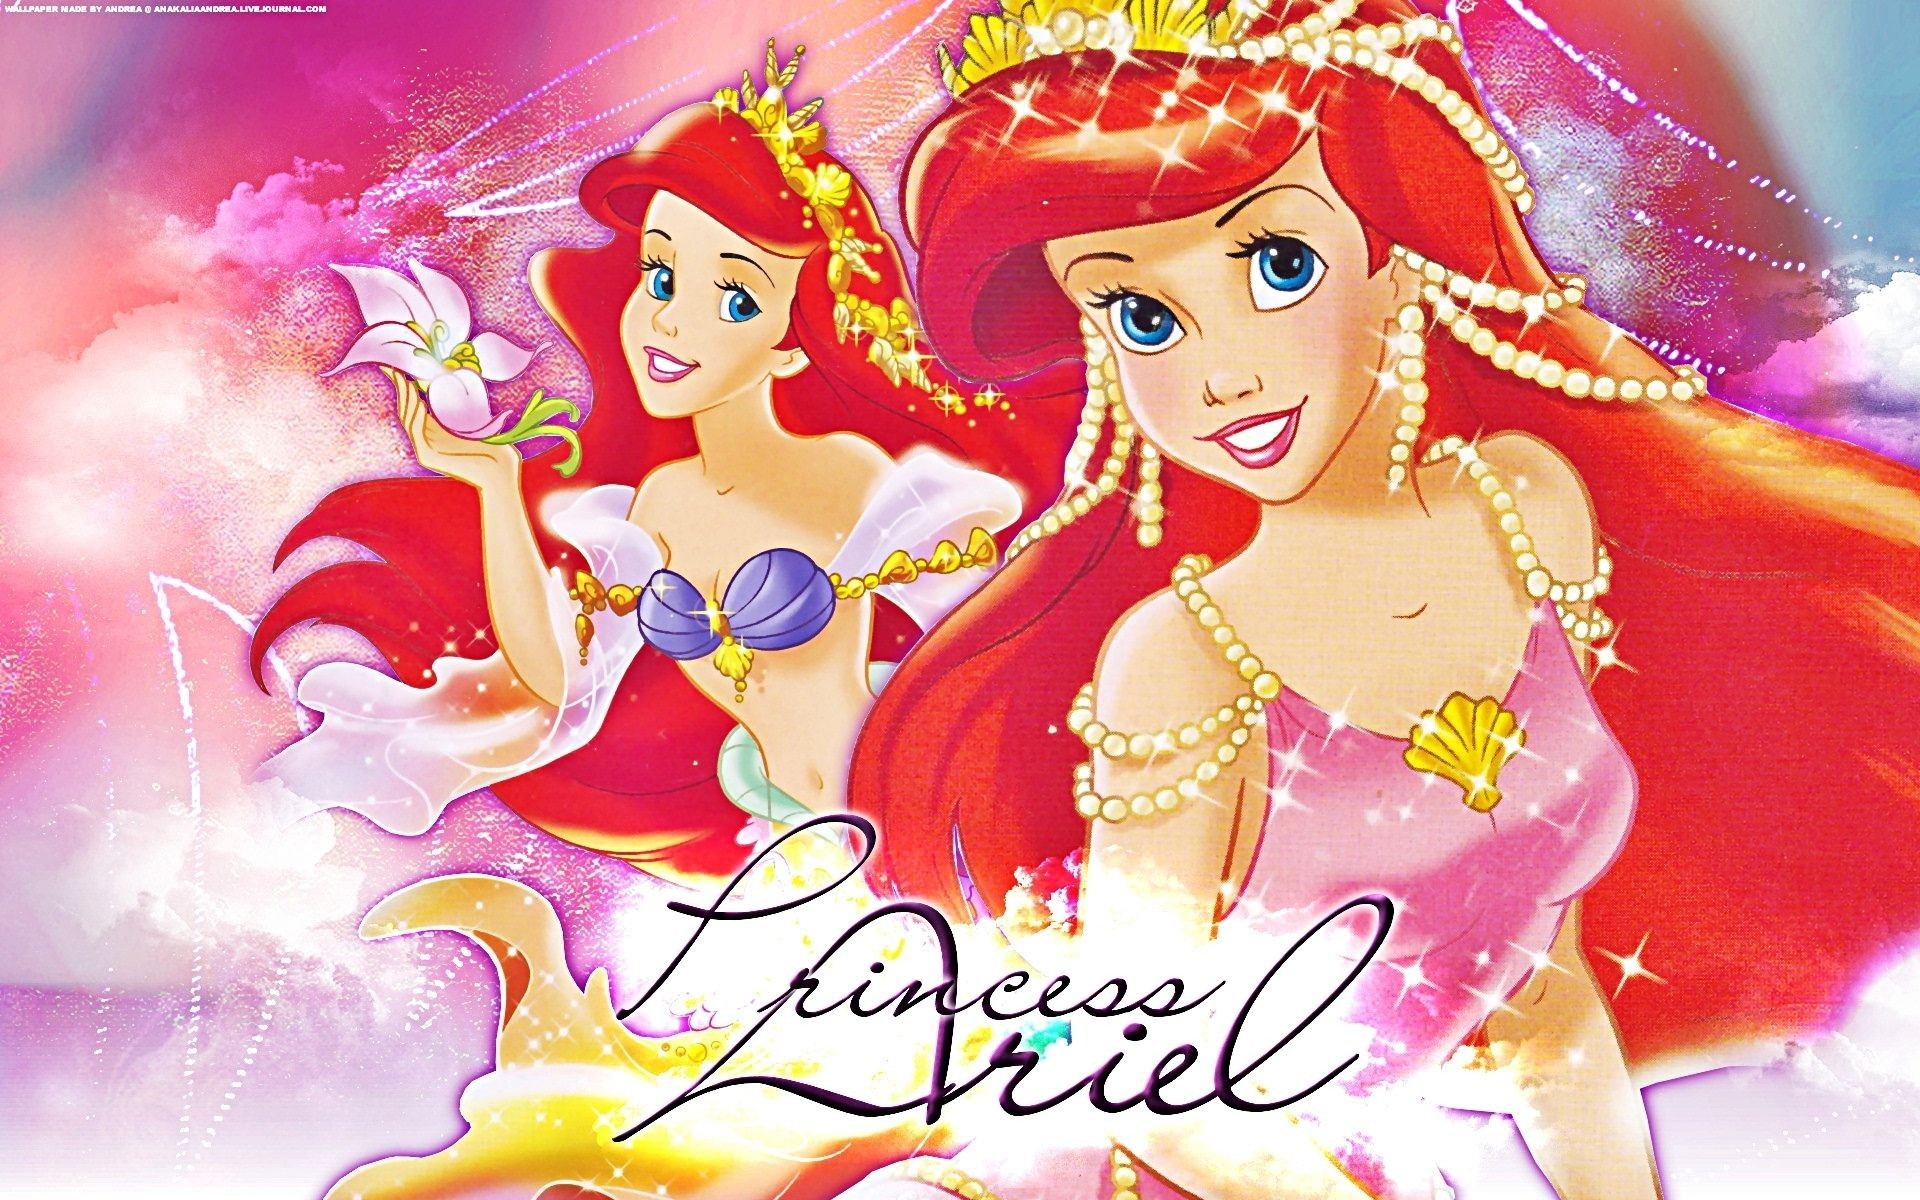 Res: 1920x1200, Walt, Disney, Wallpapers, Princess, Ariel, Walt, Disney, Characters, High,  Resolution, Free, Desktop, Background, High Resolution Images, Display,  Wallpaper ...